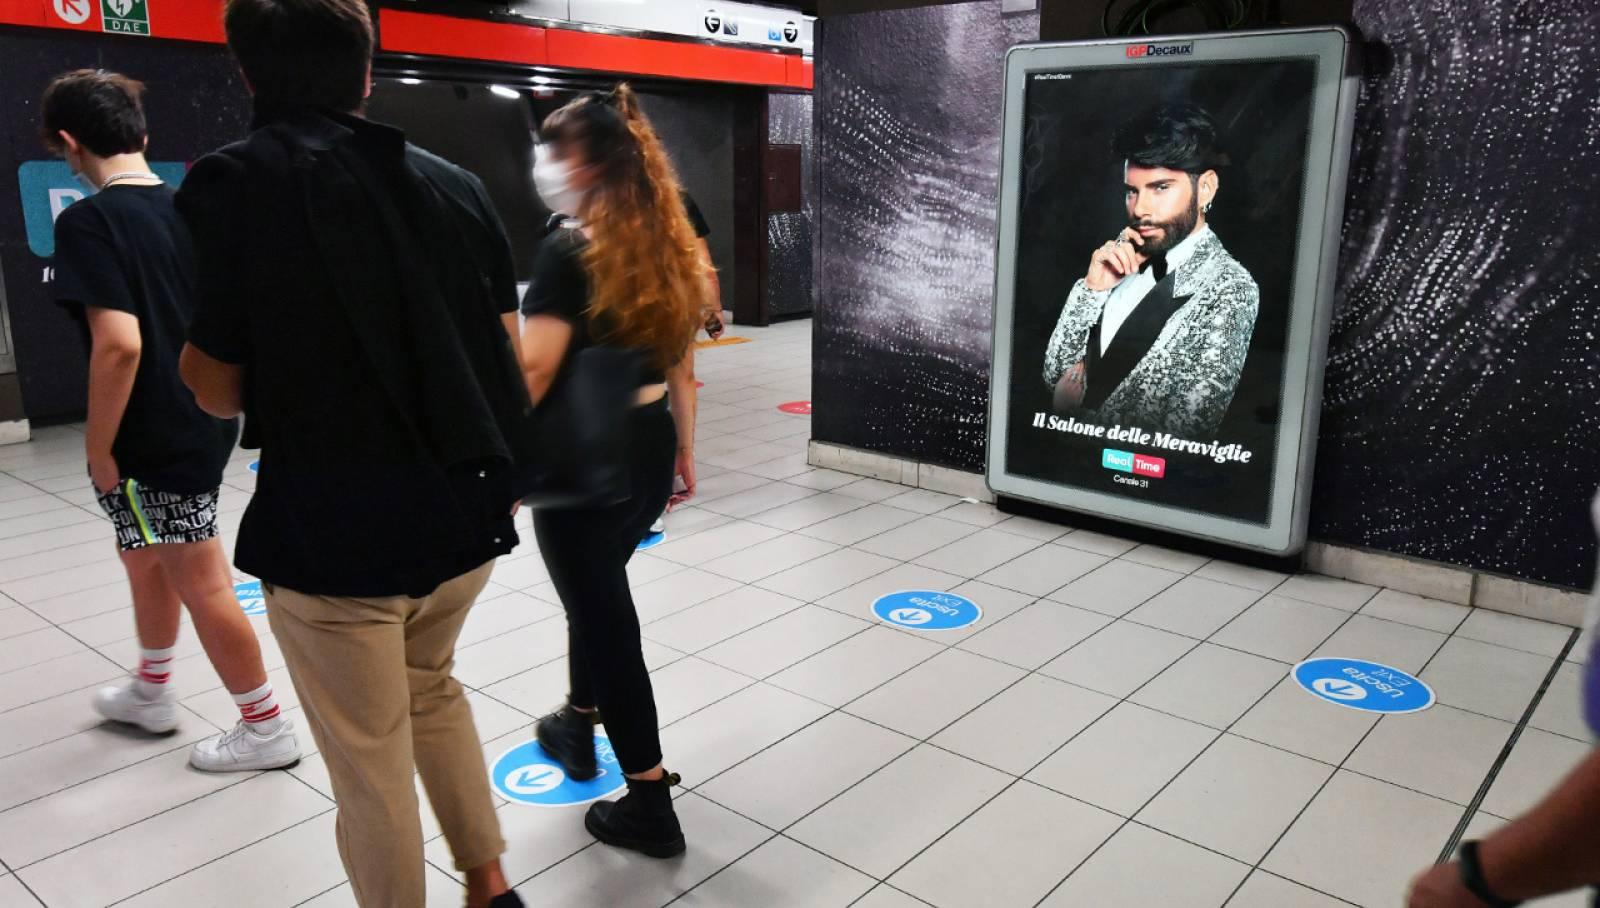 IGPDecaux Milano pubblicità in metropolitana Station Domination per Discovery Real Time